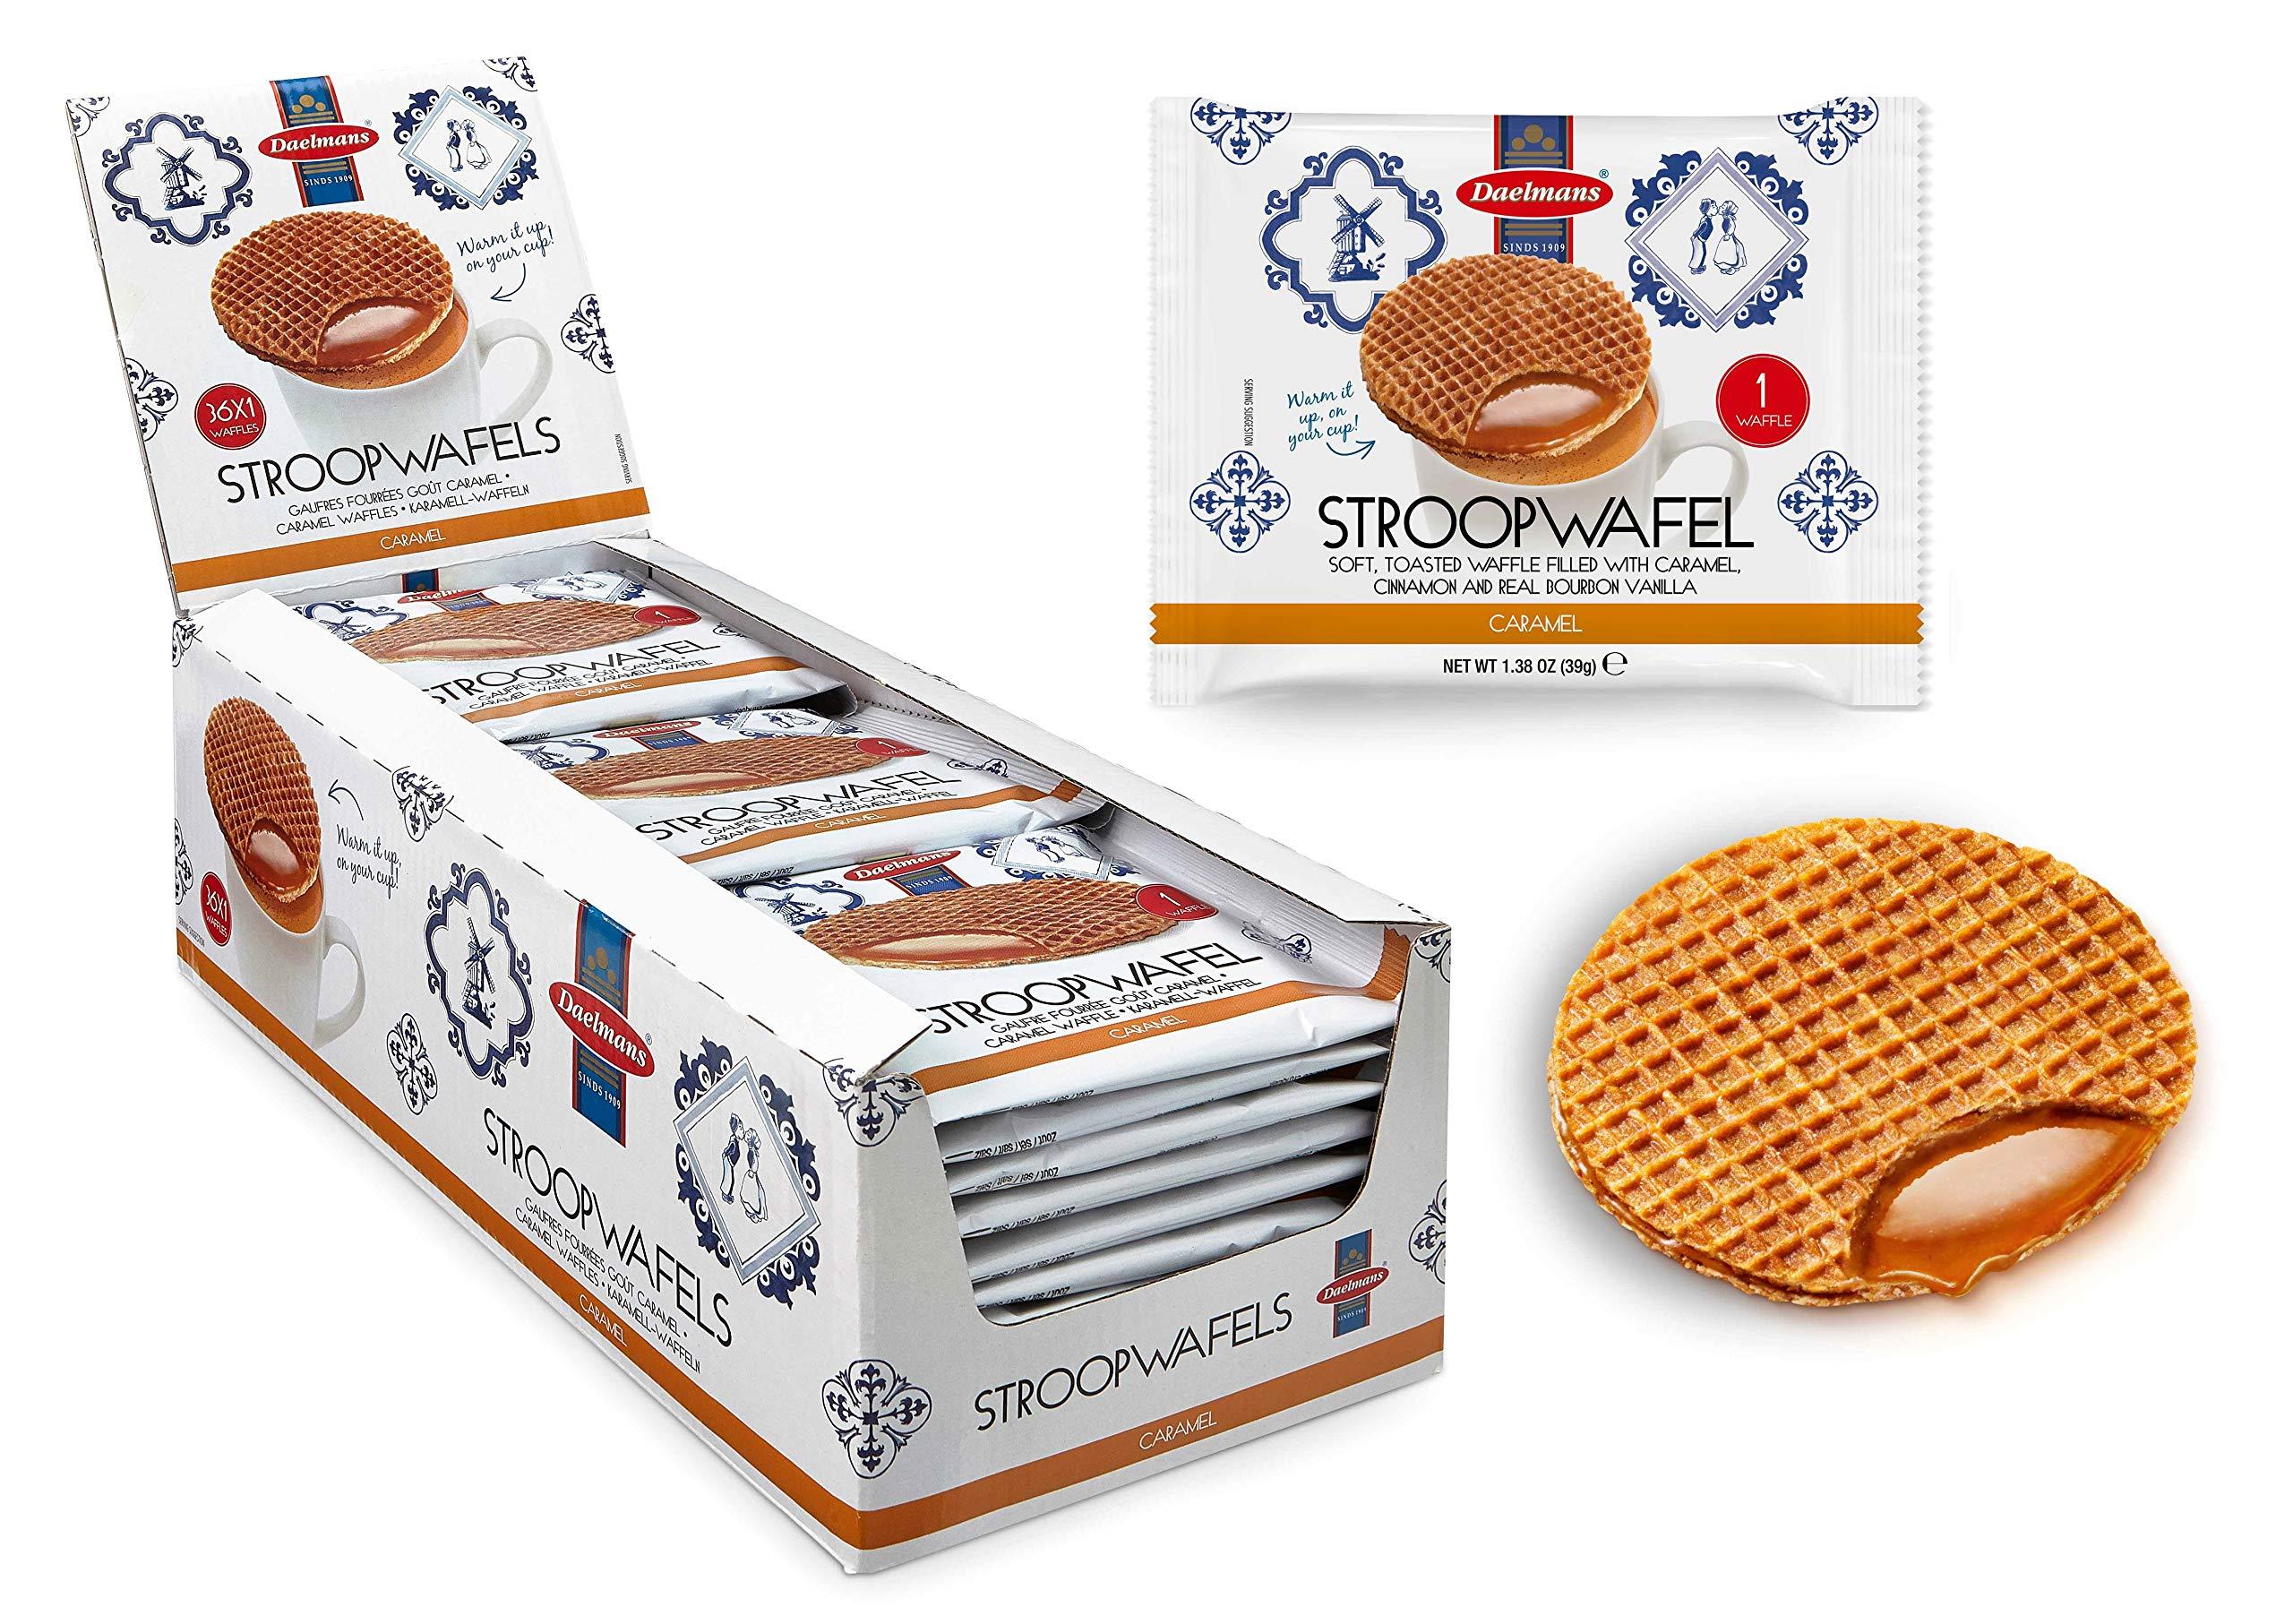 Daelmans Stroopwaffels | Caramel Stroopwaffle | Caramel Wafers - 39 g x 36 in a Box - Warm it up on Your Cup